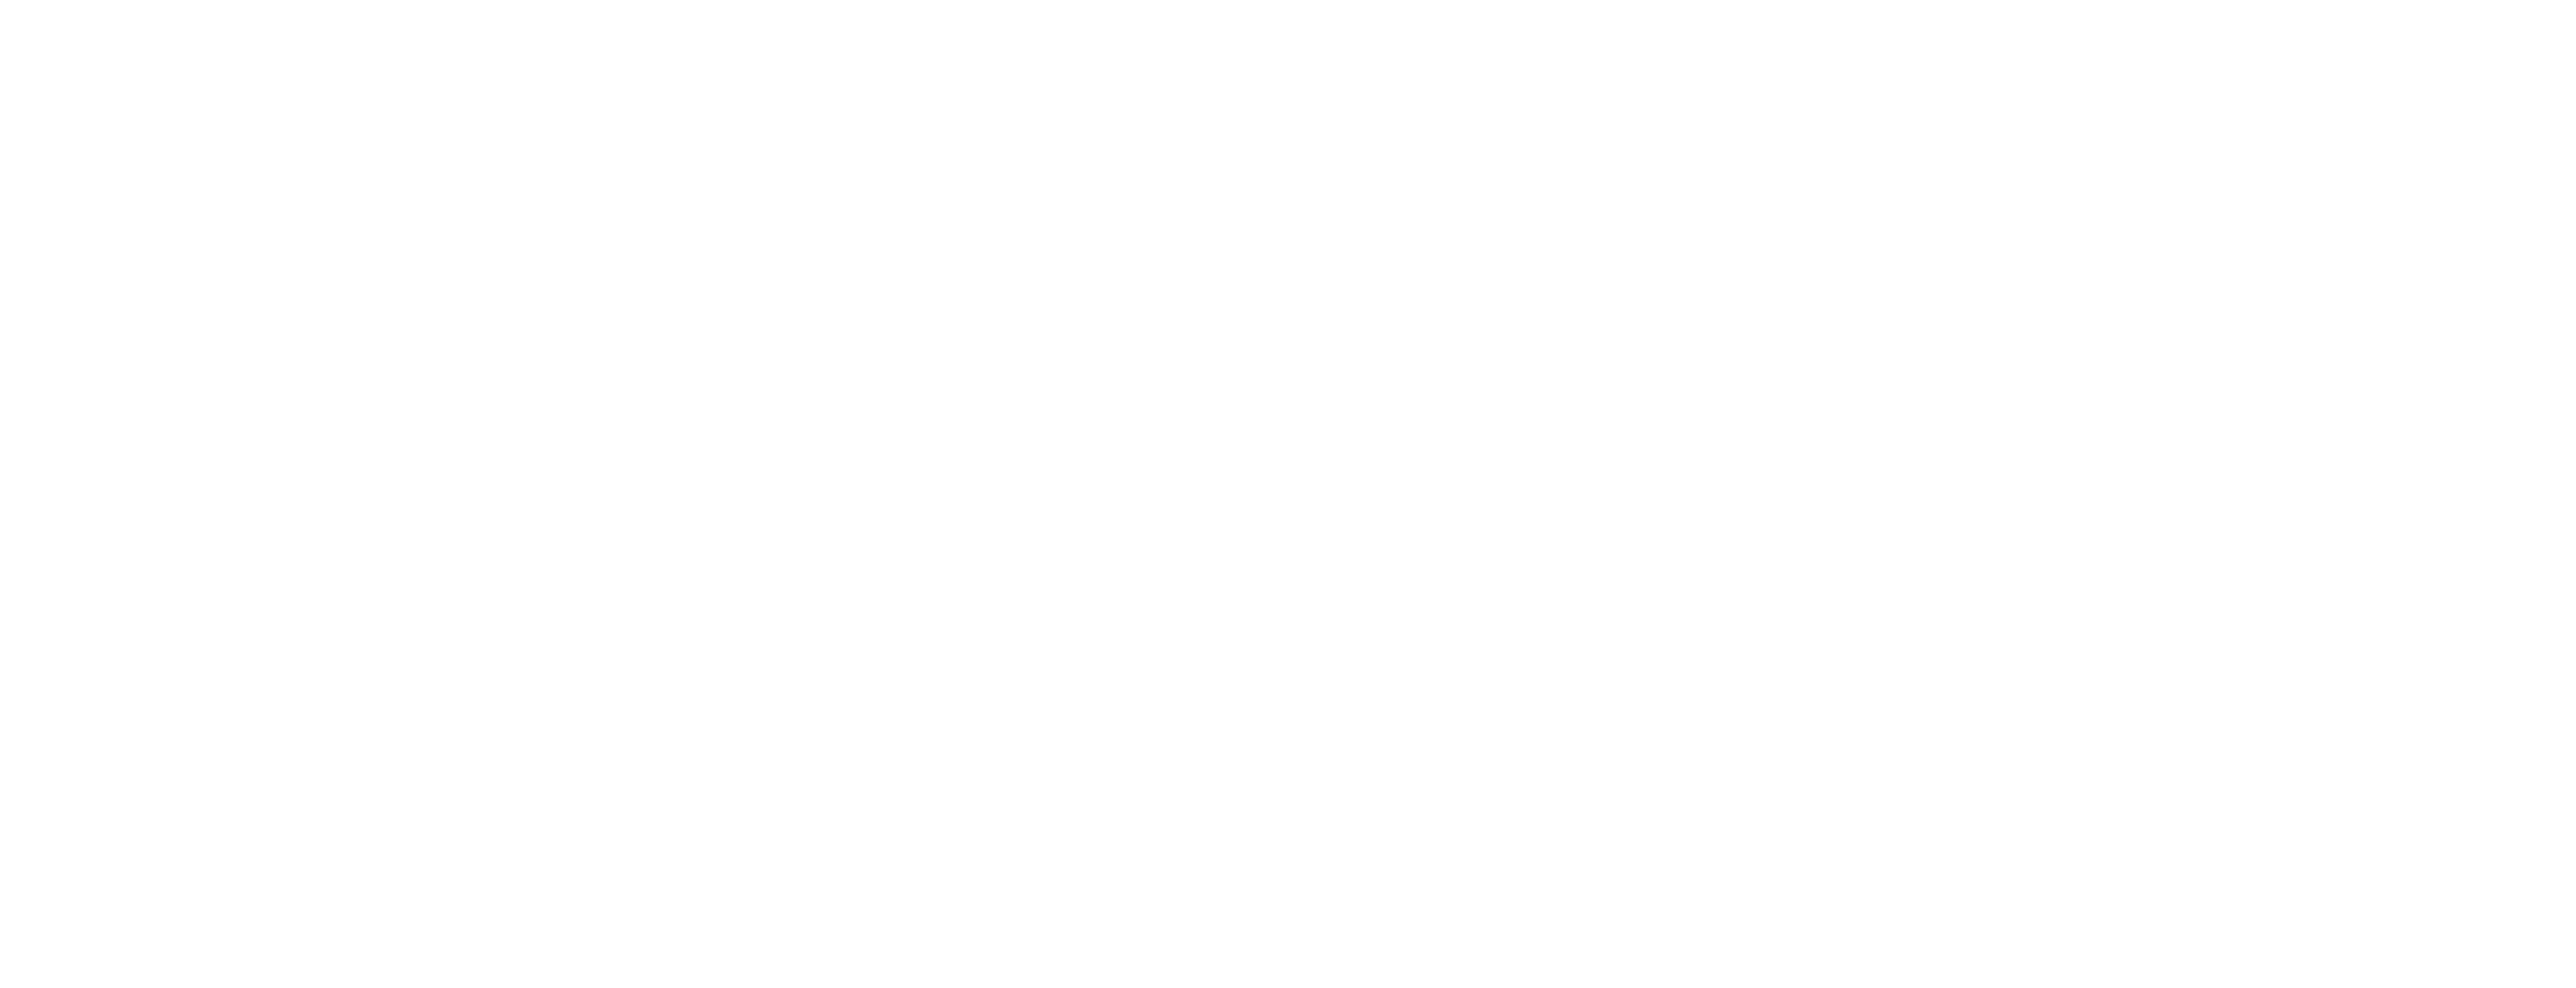 Brightery News